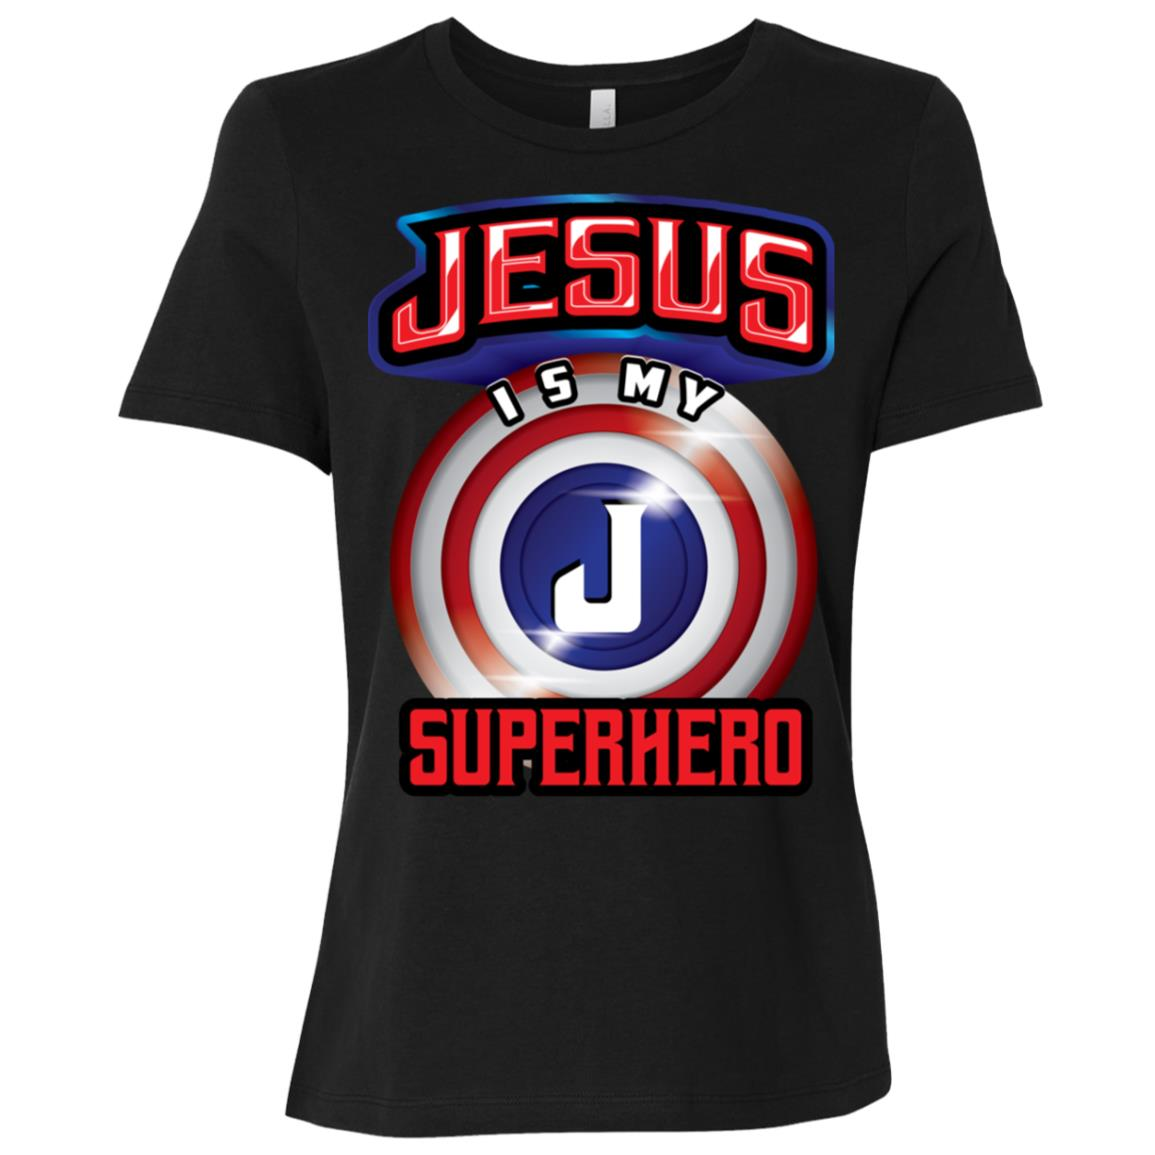 Jesus Is My Superhero Cute Powerful Christian Gift Women Short Sleeve T-Shirt